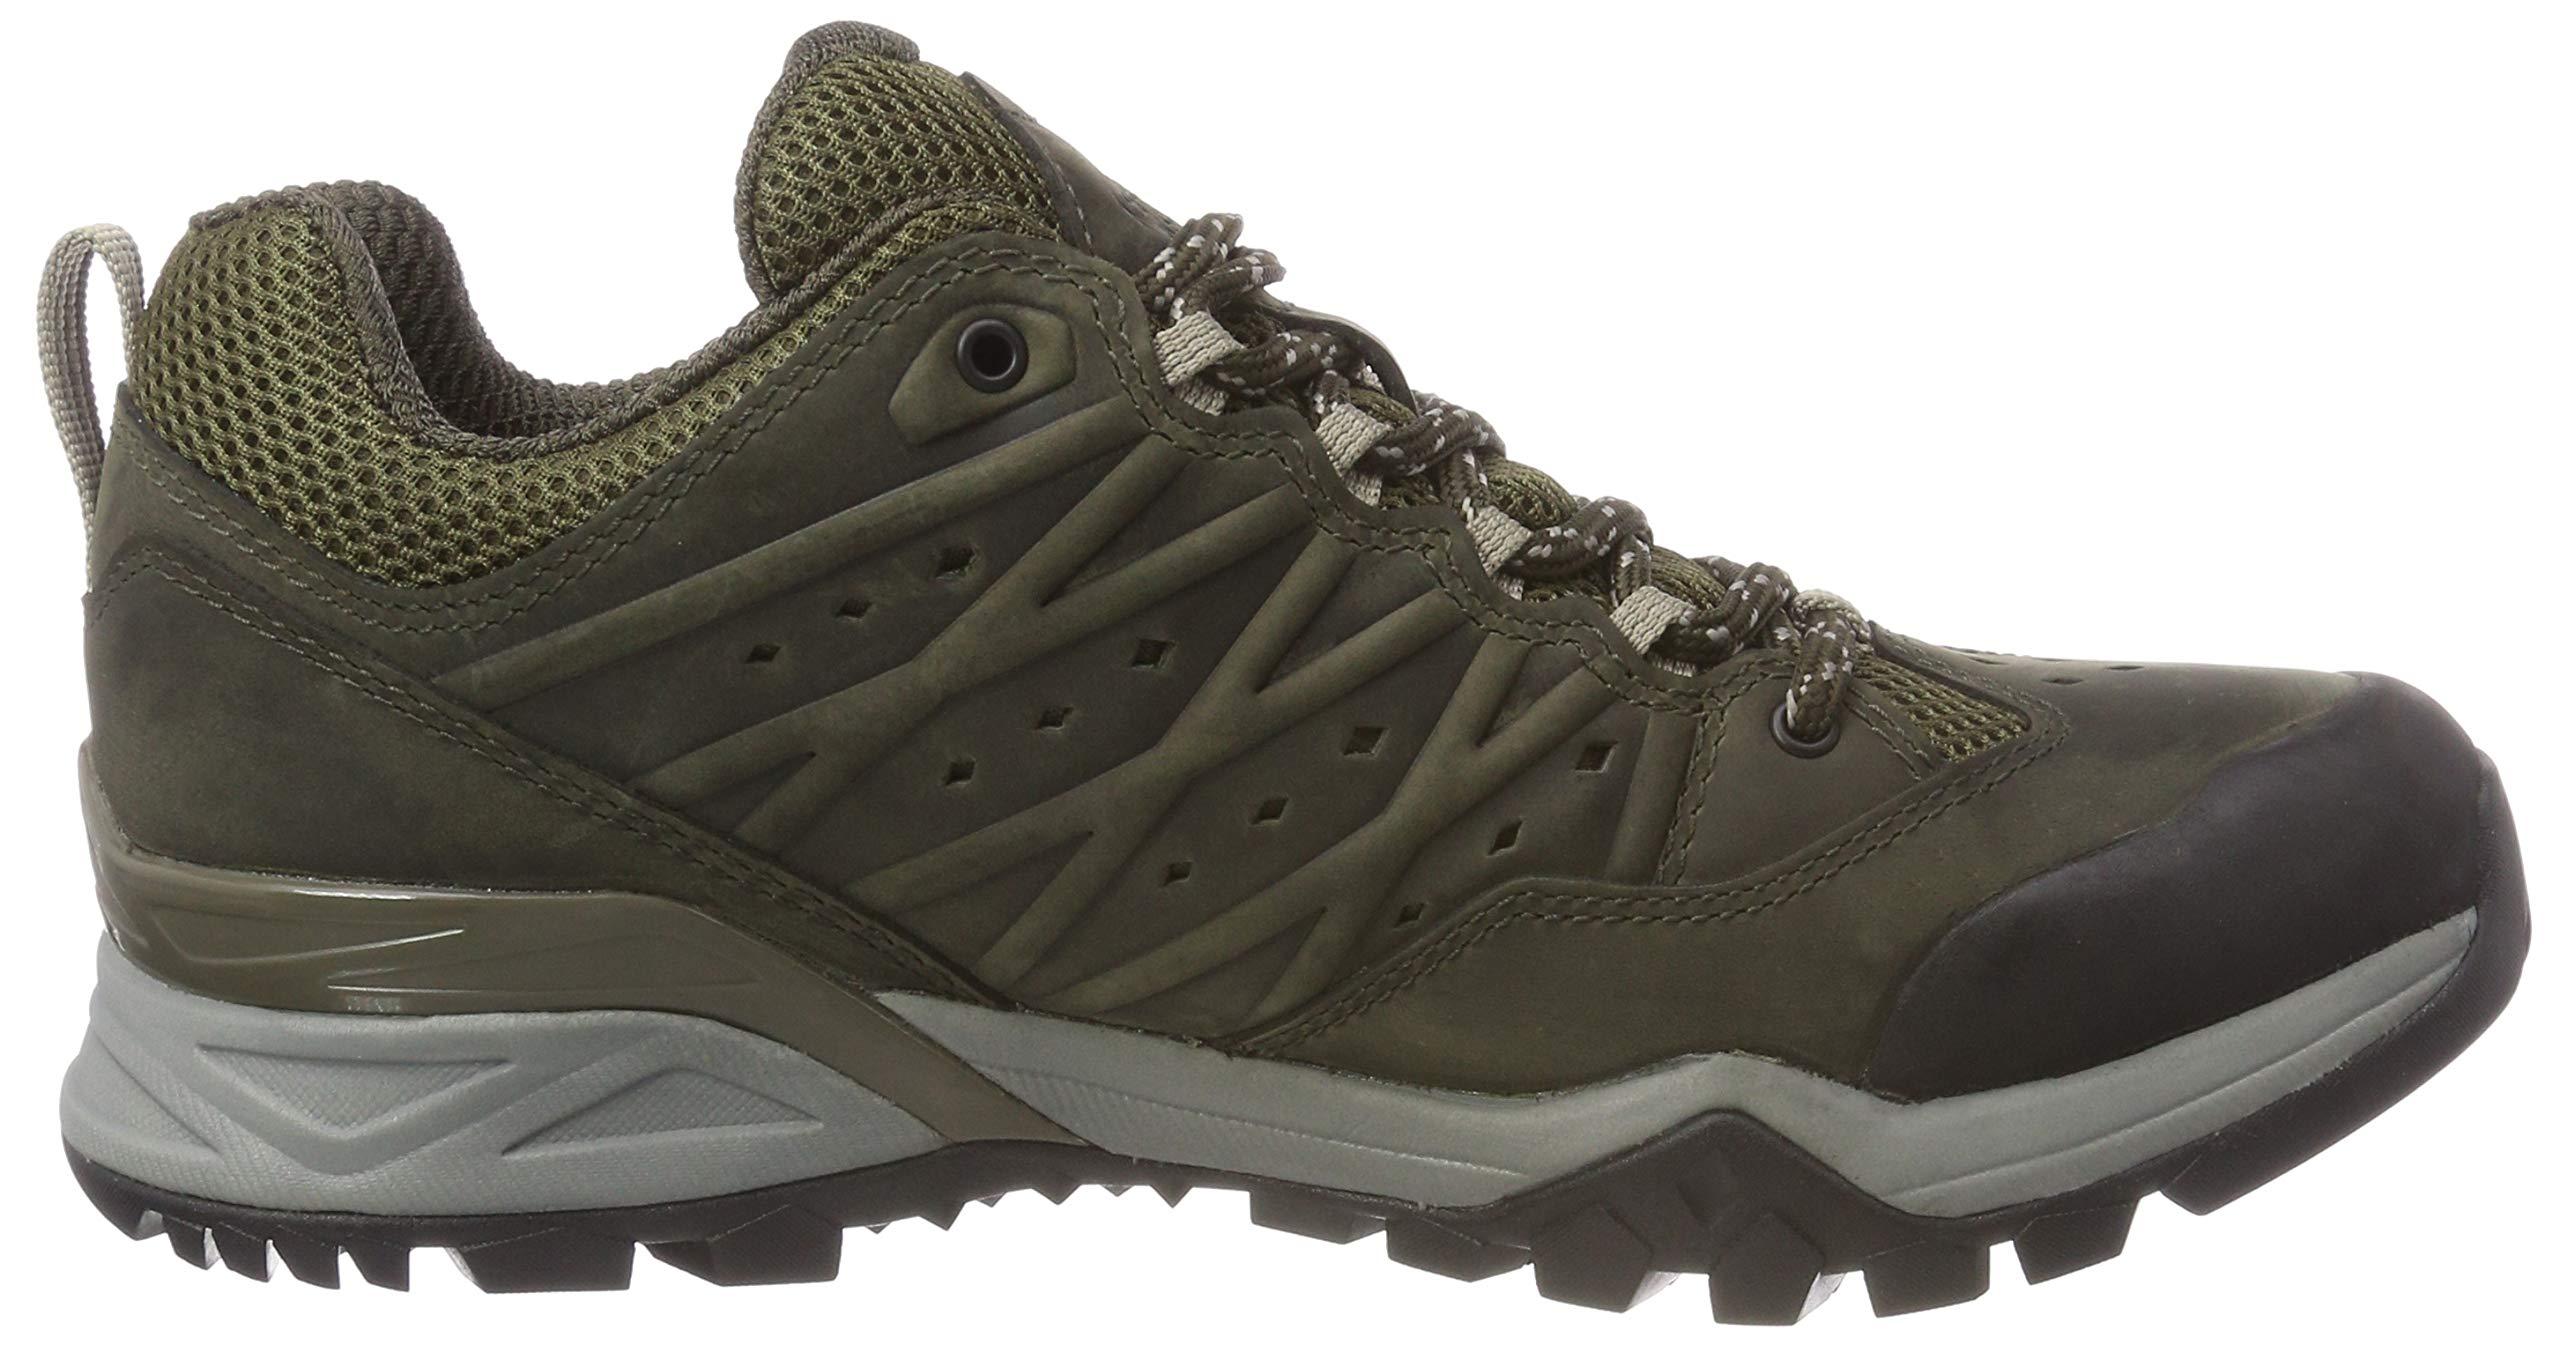 71Ru2 Nu1PL - THE NORTH FACE Men's Hedgehog Ii GTX Low Rise Hiking Boots